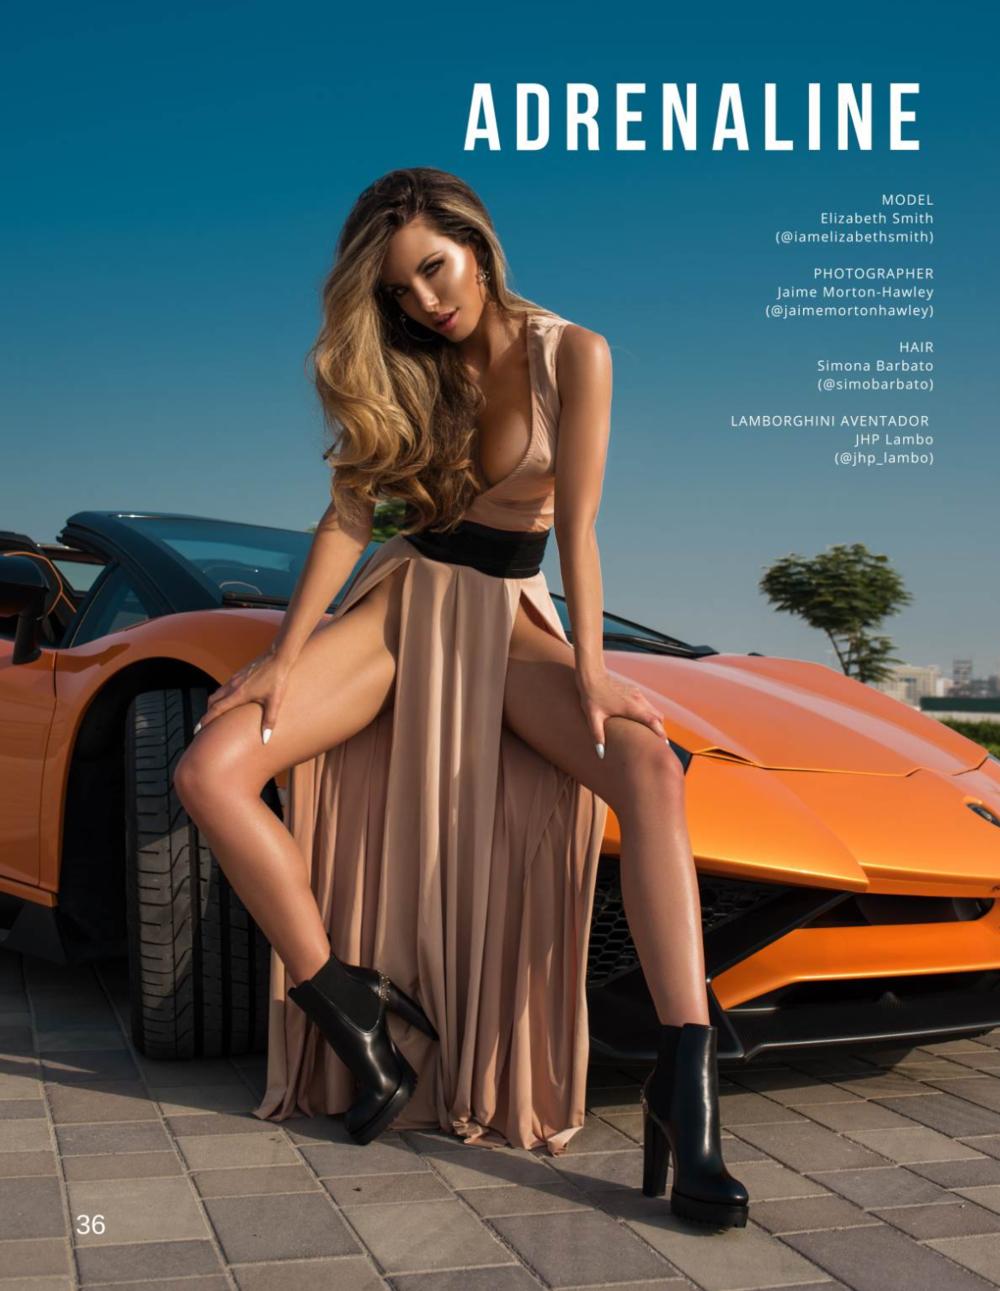 Model Elizabeth Smith for Boulevard Magazine by Jaime Morton-Hawley | Booked by Nova Prime PR